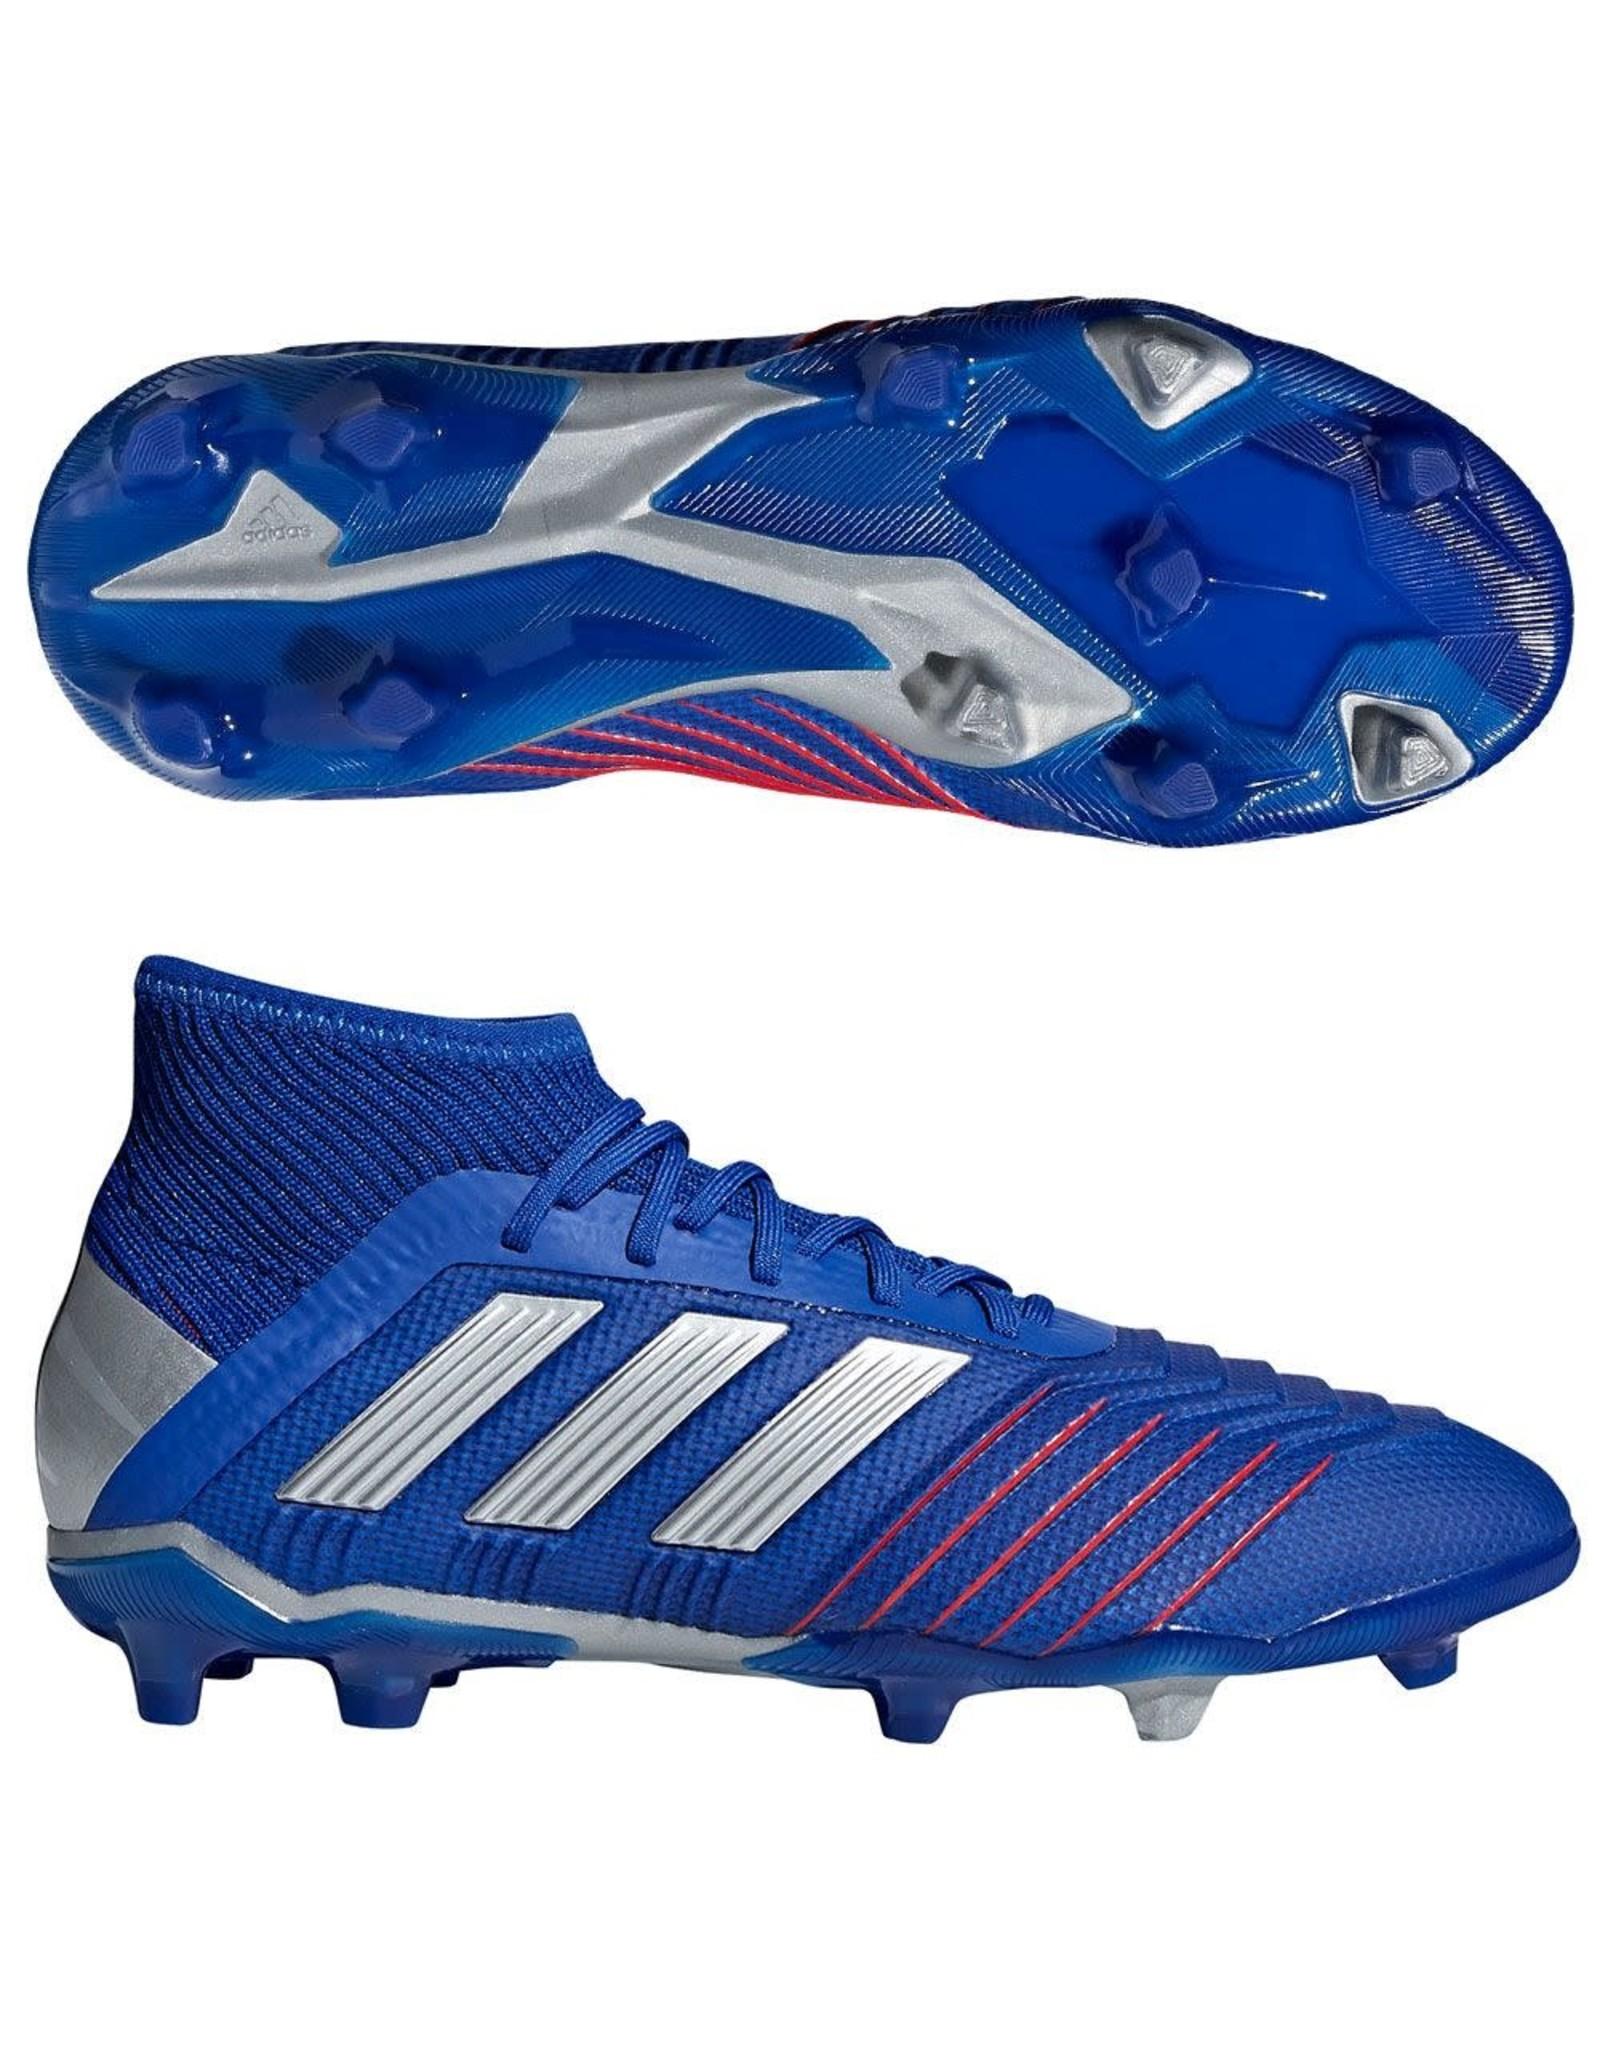 Adidas Adidas PREDATOR 19.1 FG Cleats (Bold Blue/Silver Metallic/Football Blue)